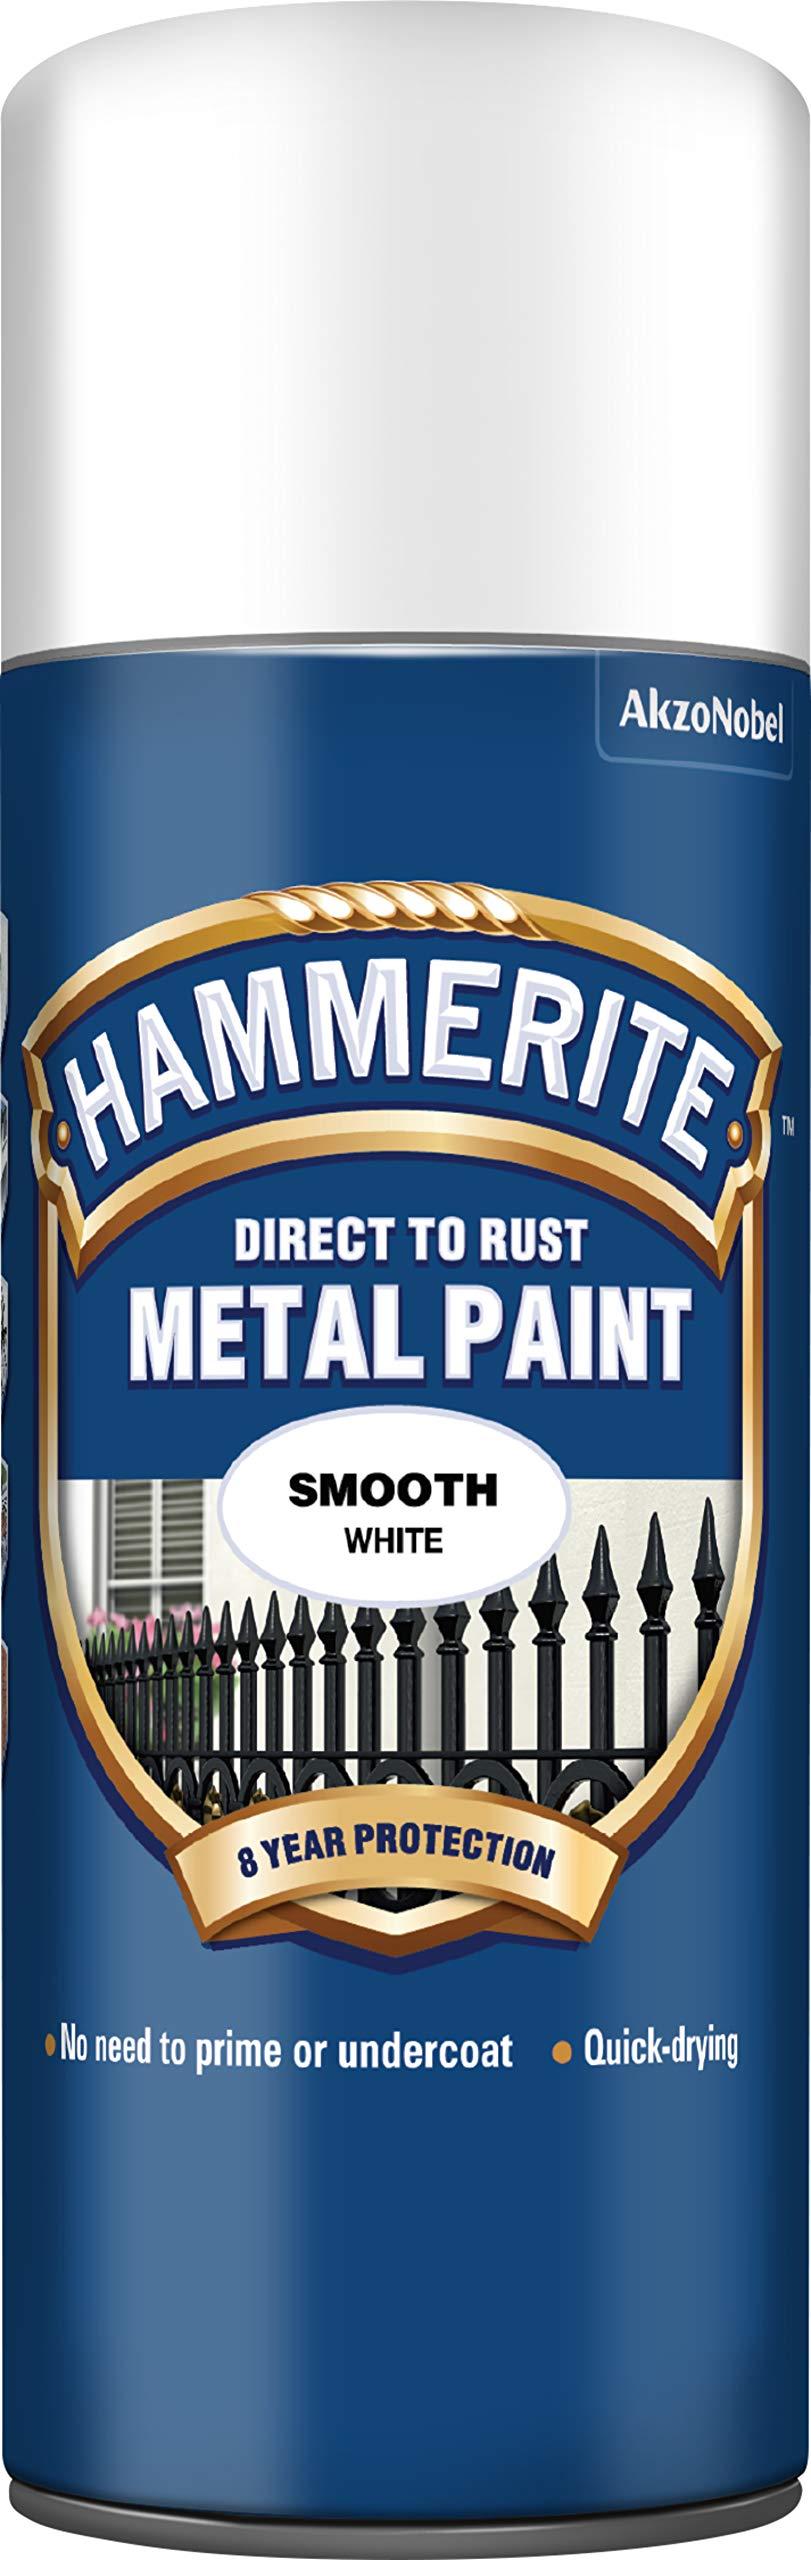 Hammerite 5084782 Metal Paint: Smooth White 400ml (Aerosol)